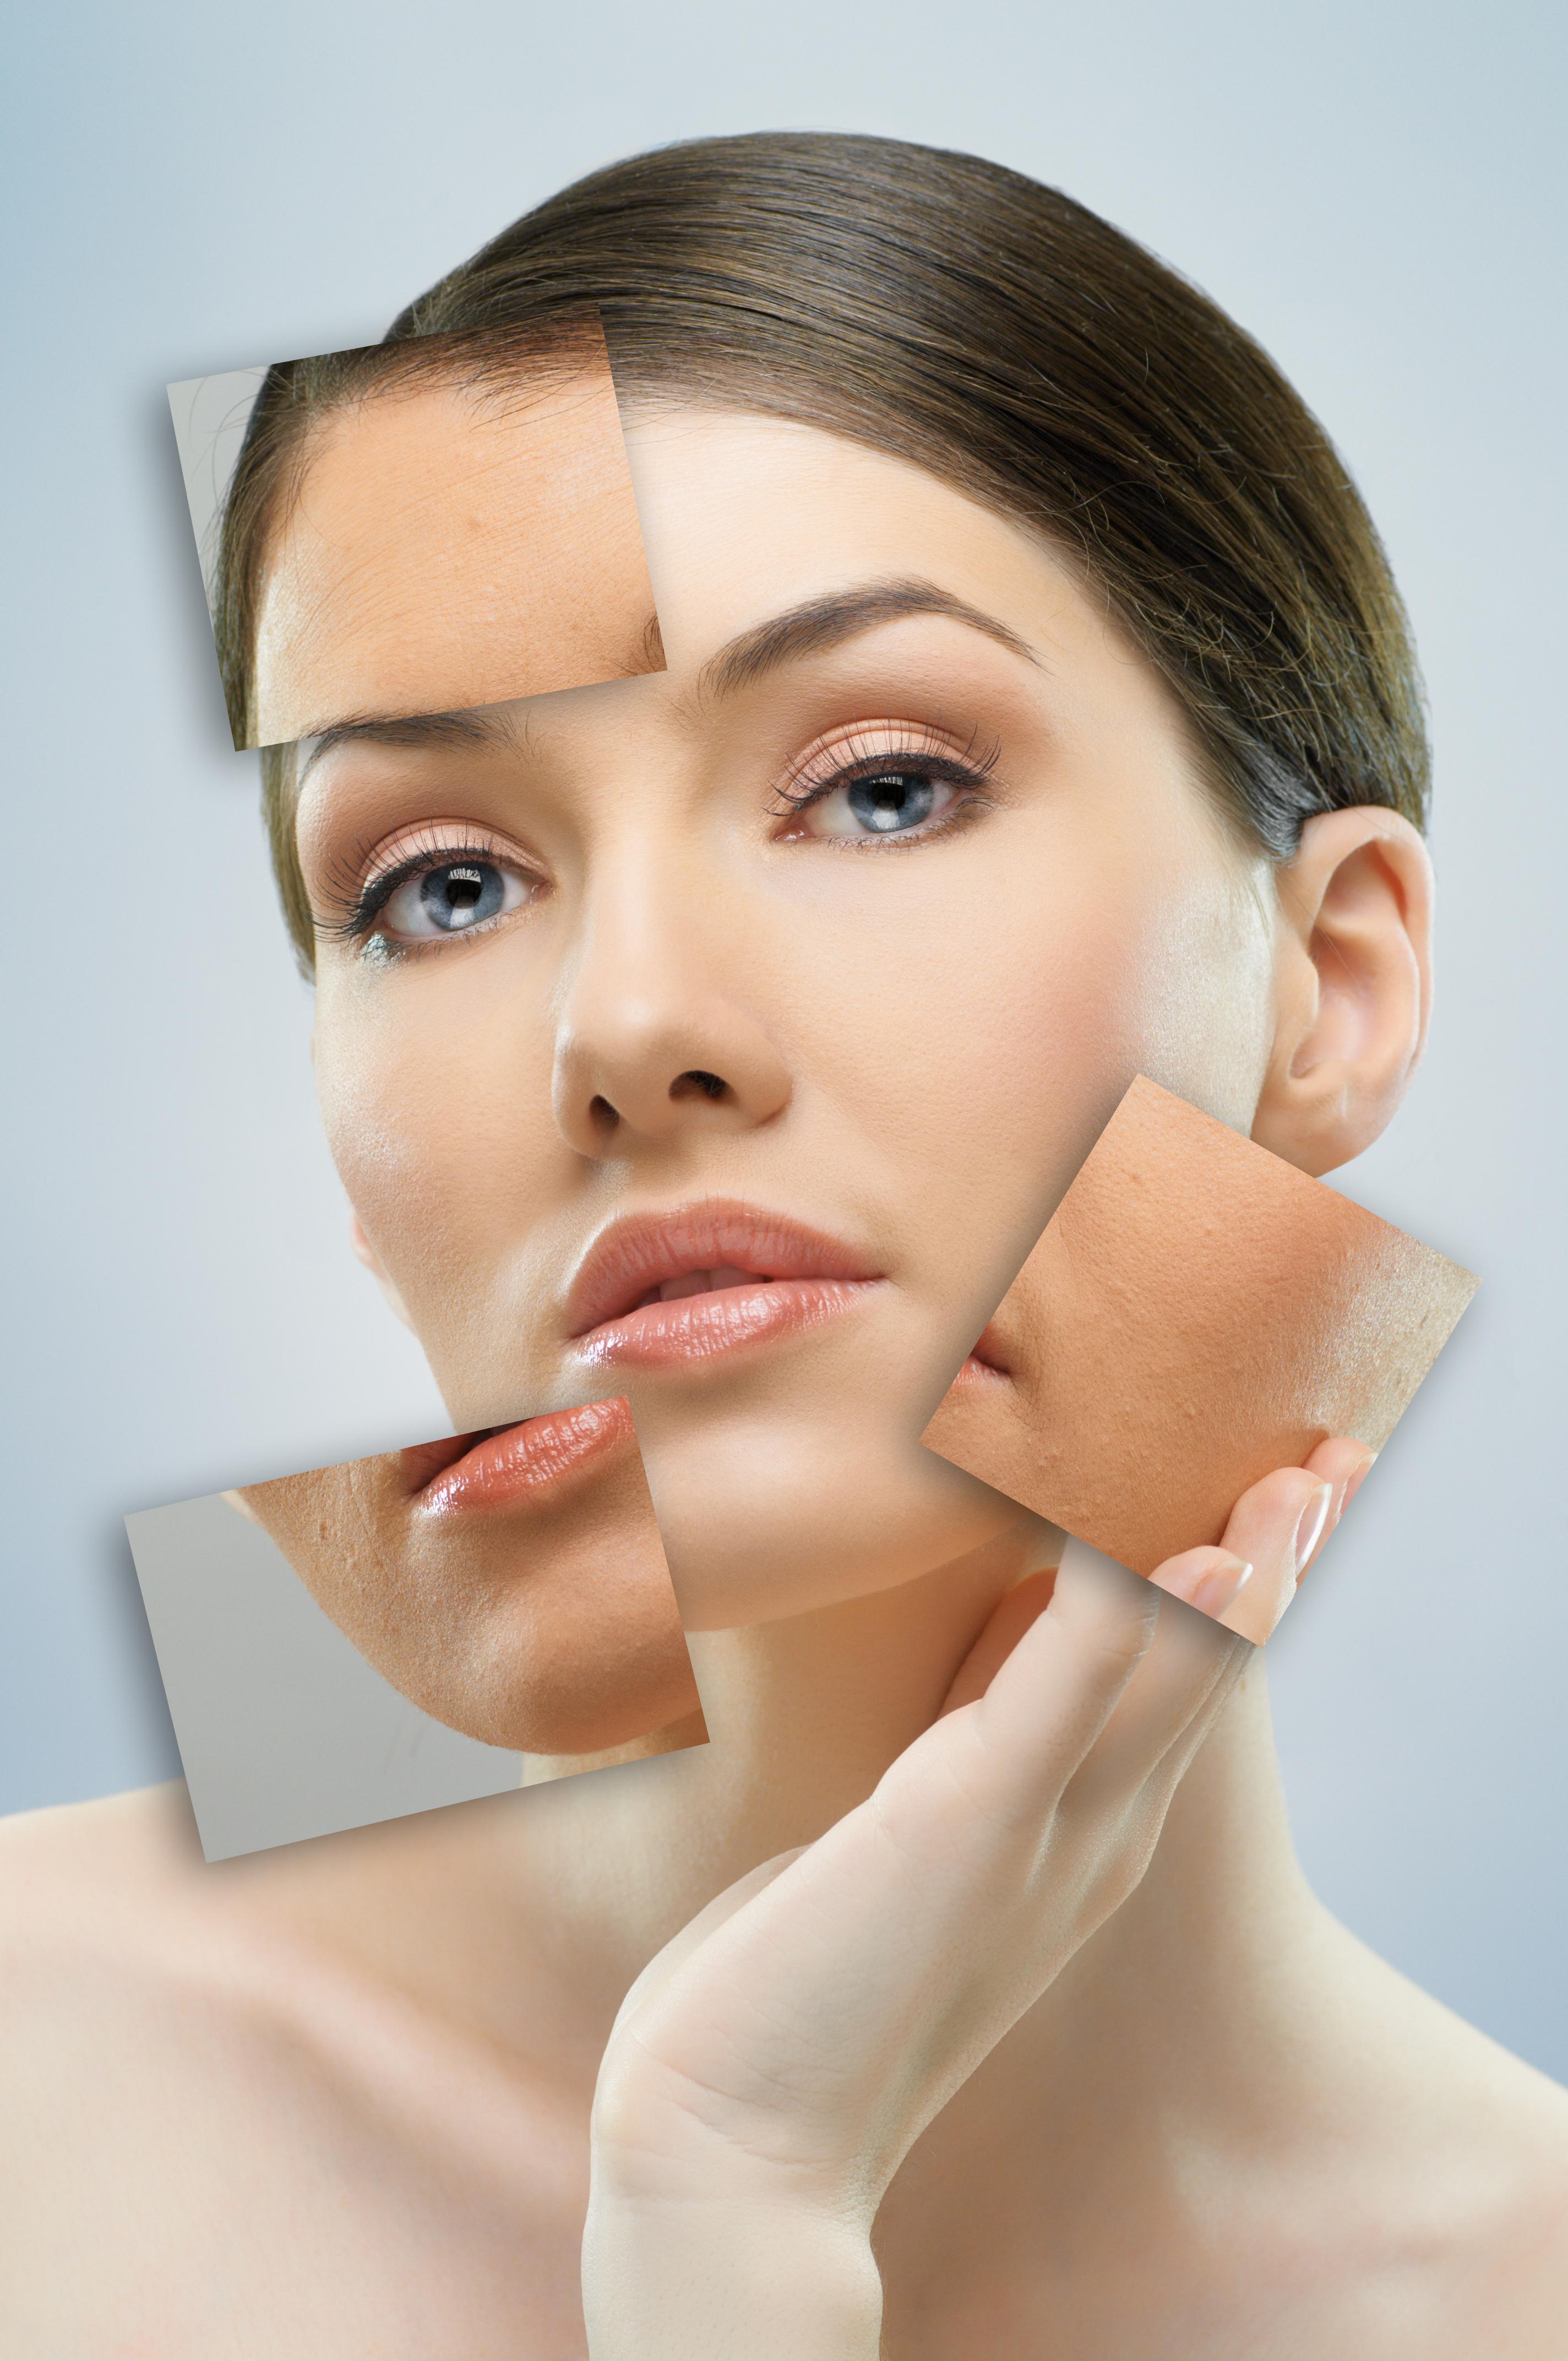 Tìm hiểu về da mặt